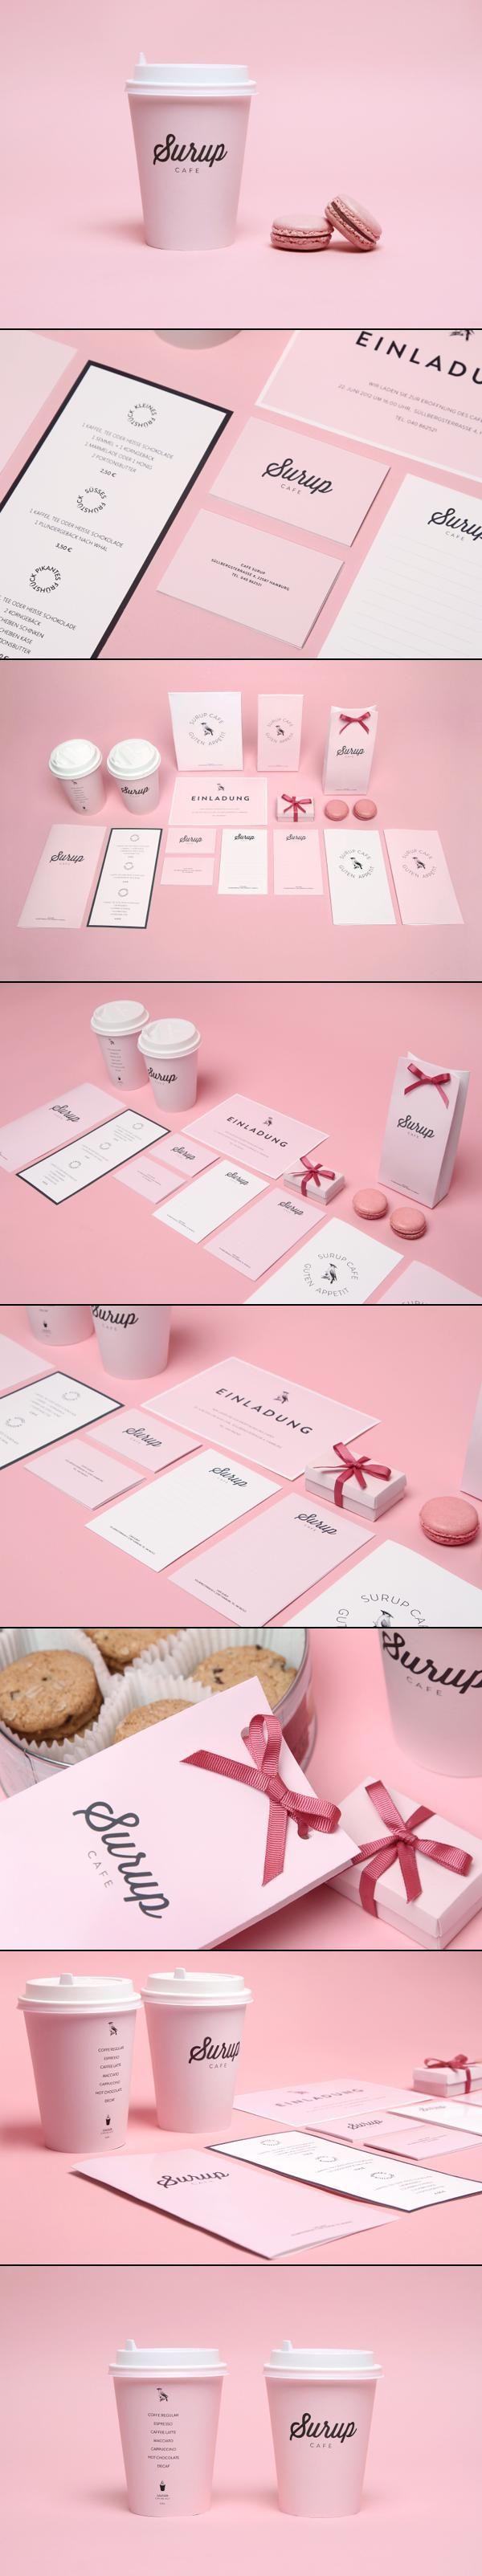 Surup Café // Feminine Pink Branding / Eye Candy // Vintage meets Modern Logo and Typography